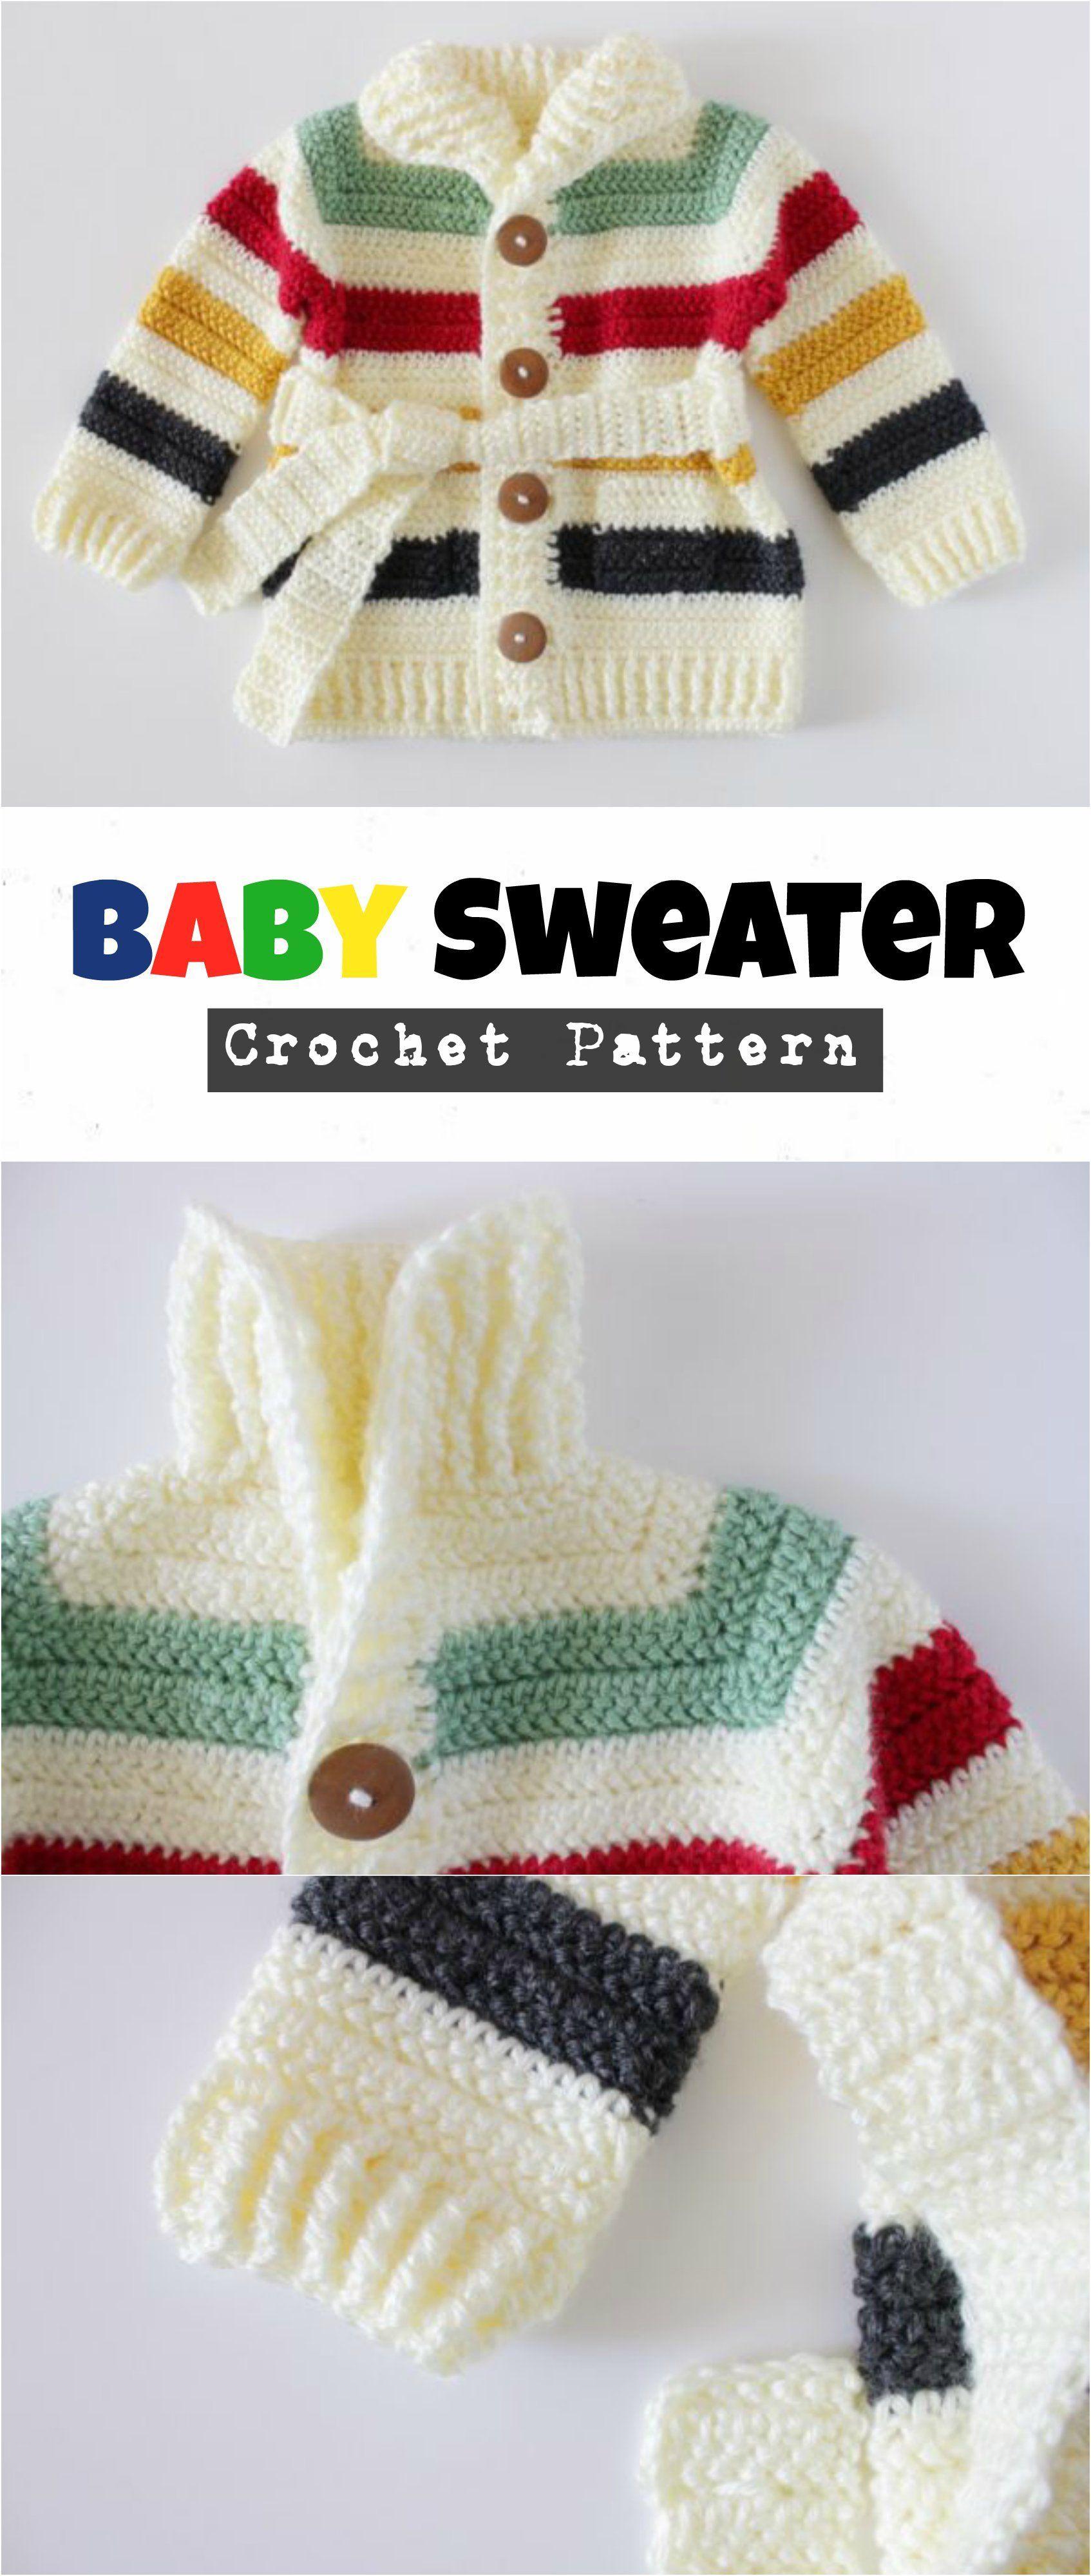 Crochet Baby Sweater   Patrones de ganchillo   Pinterest   Abrigos ...